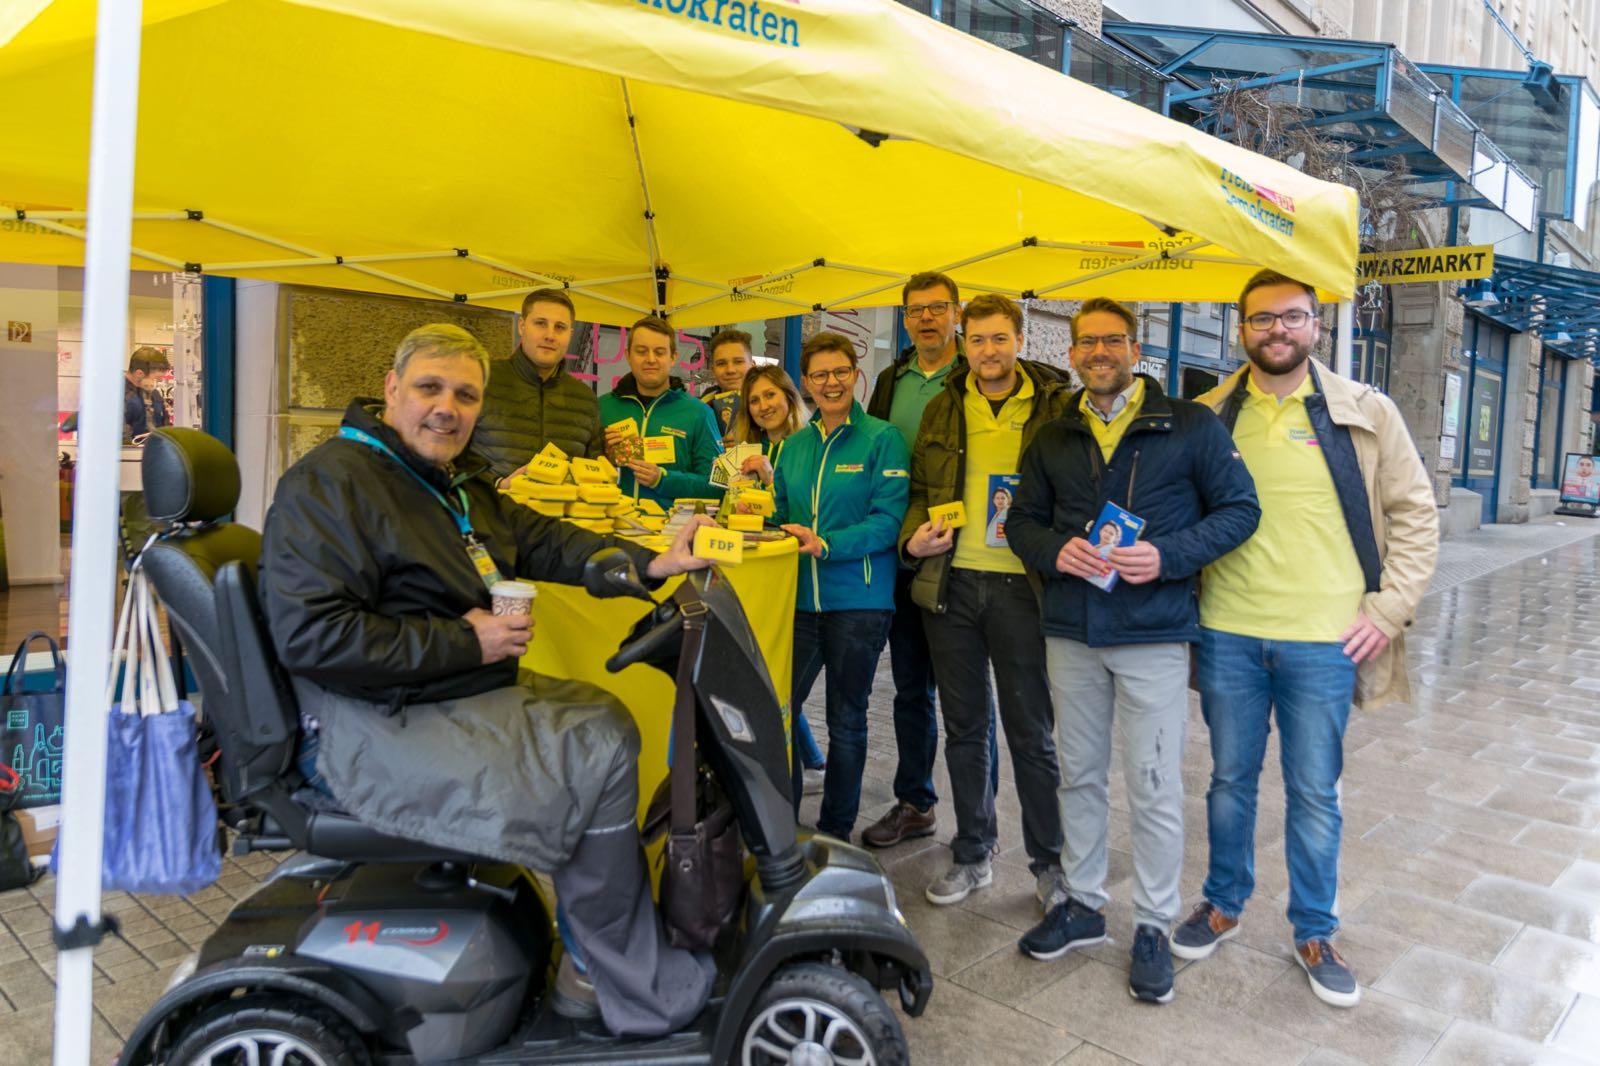 Infostand der FDP zur EU-Wahl